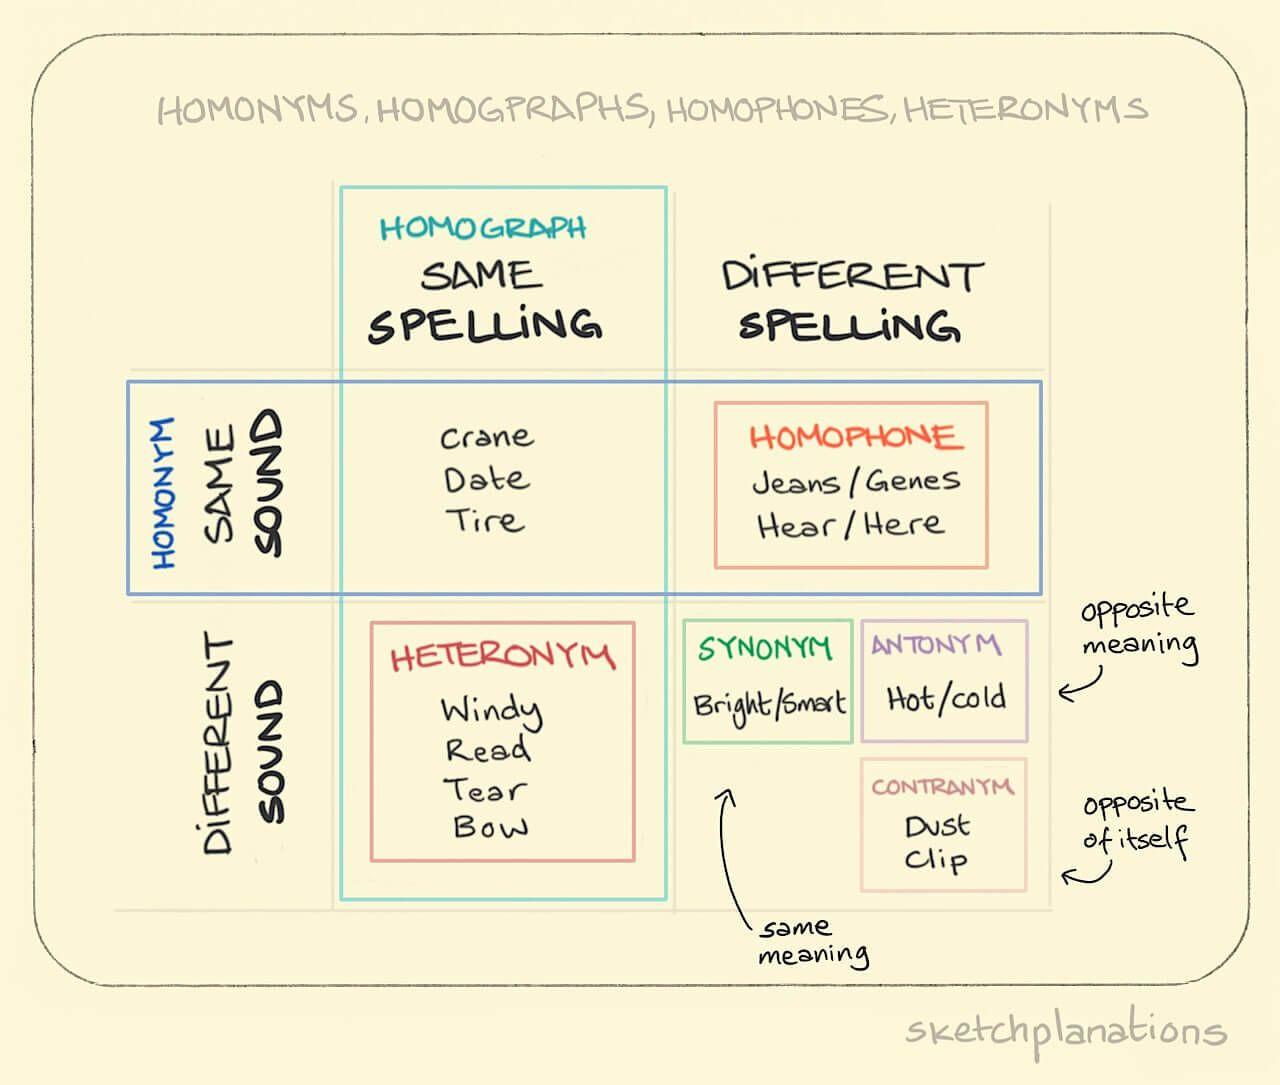 Homonyms Homographs Homophones Heteronyms This One